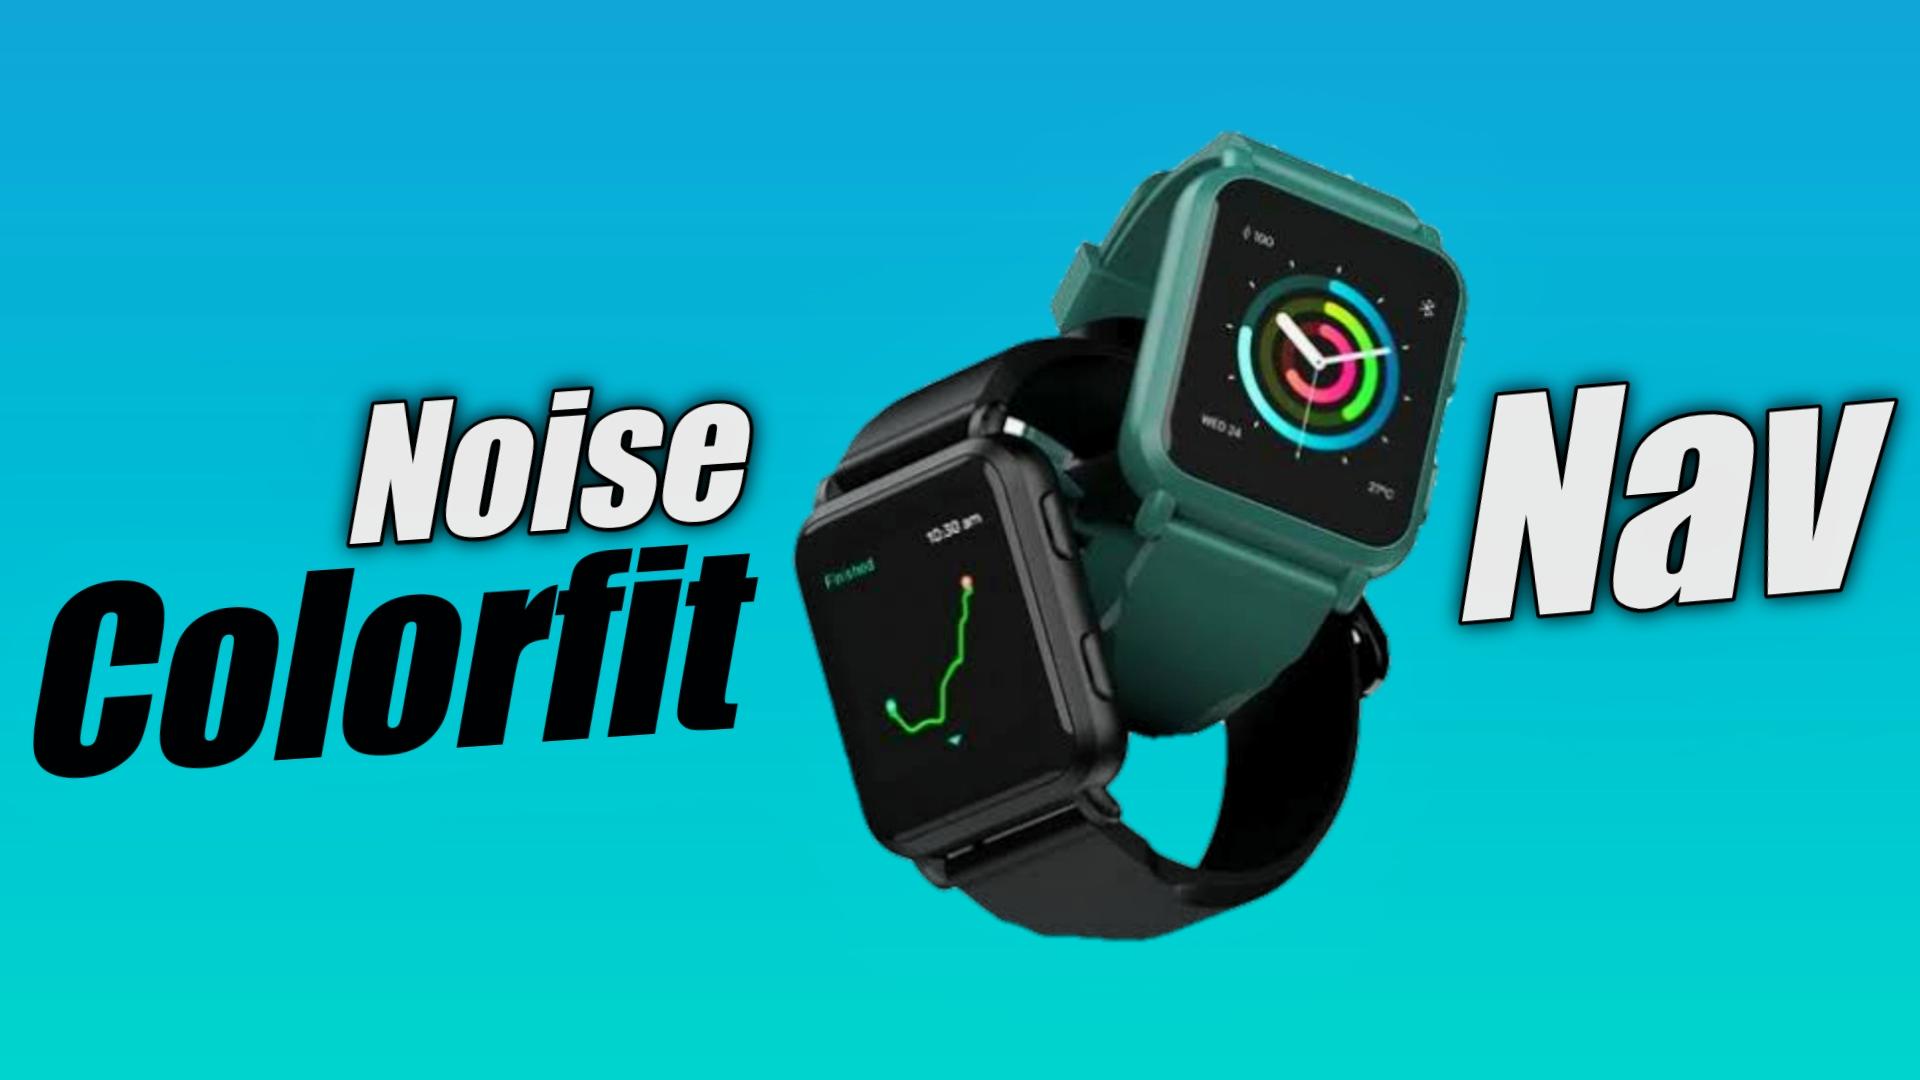 noise colorfit nav smartwatch